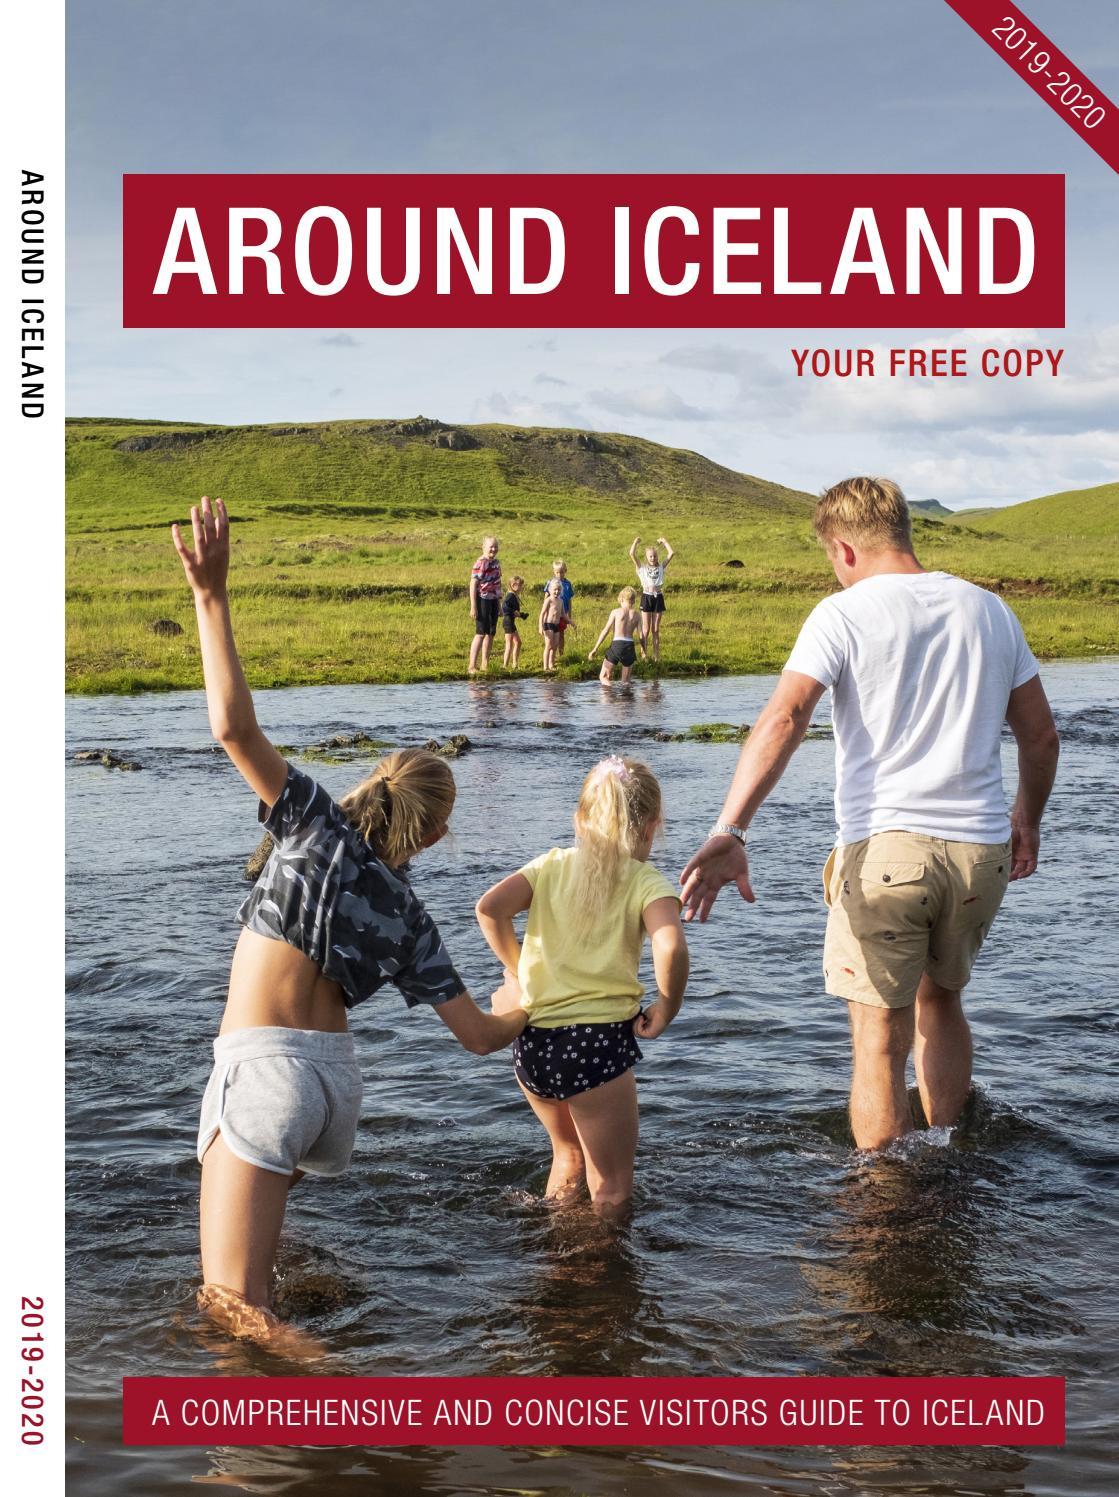 Branch County Fair 2020.Around Iceland 2019 2020 By Md Reykjavik Issuu